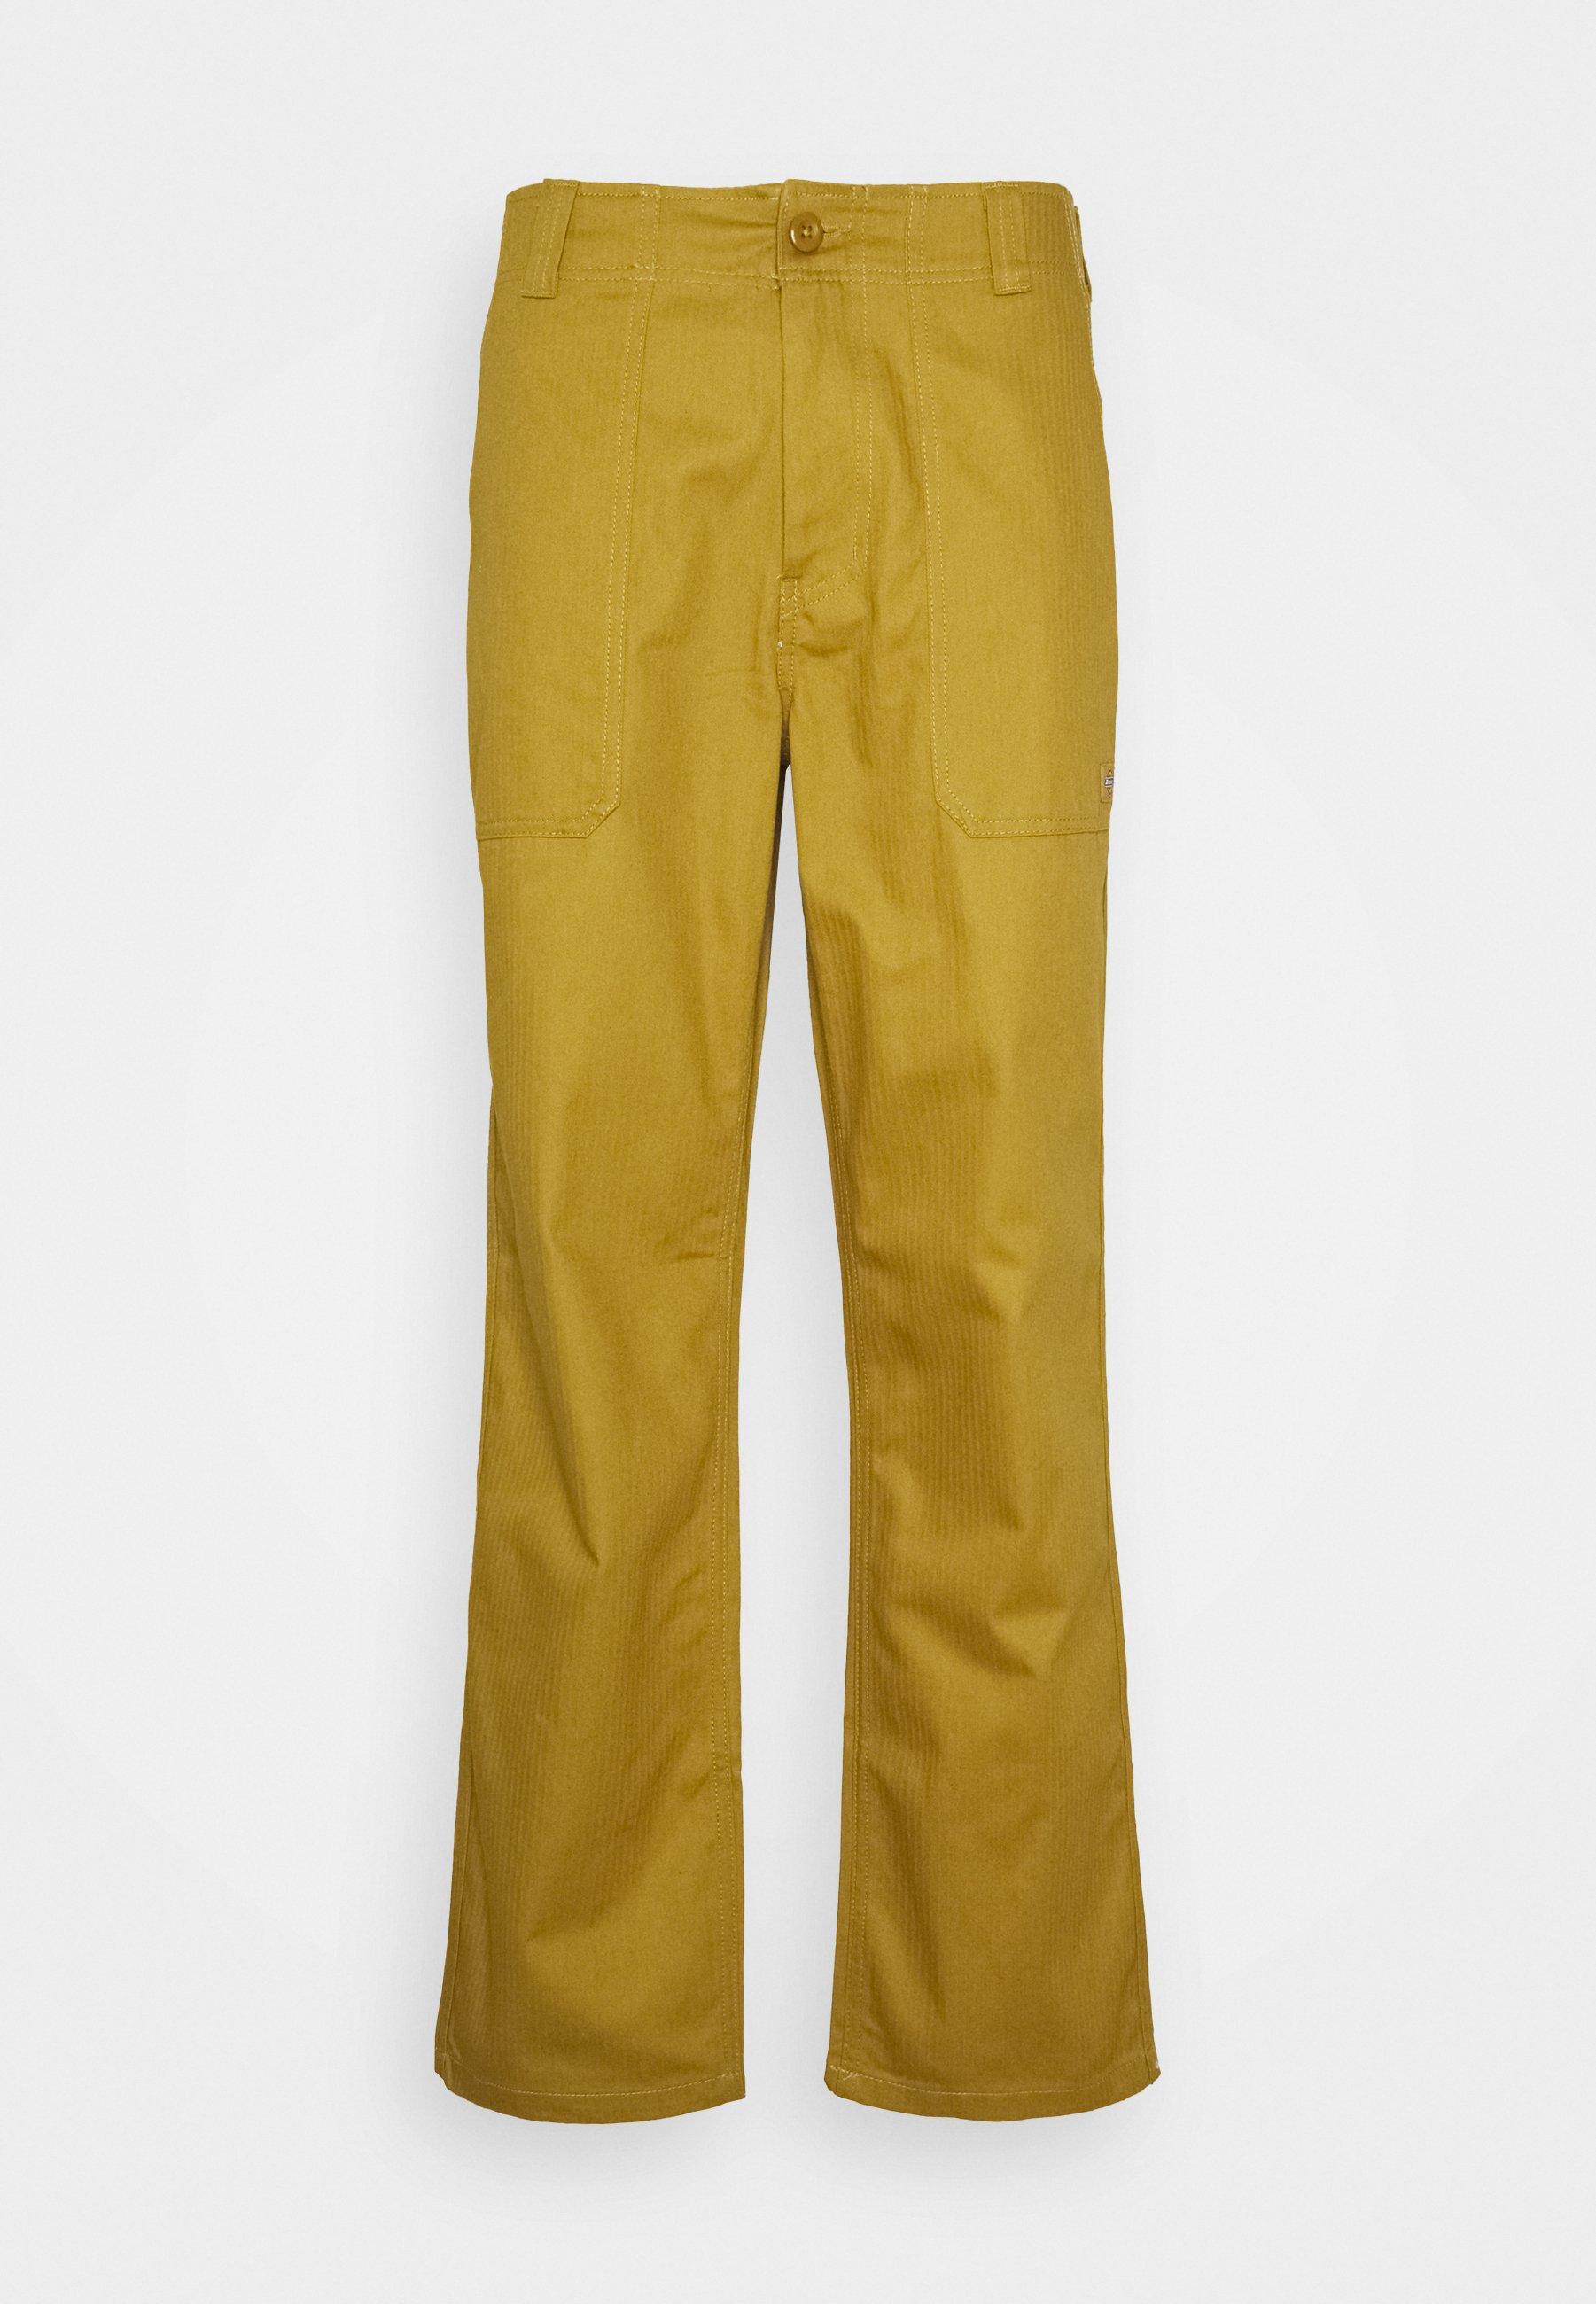 Uomo FUNKLEY FATIGUE PANT - Pantaloni